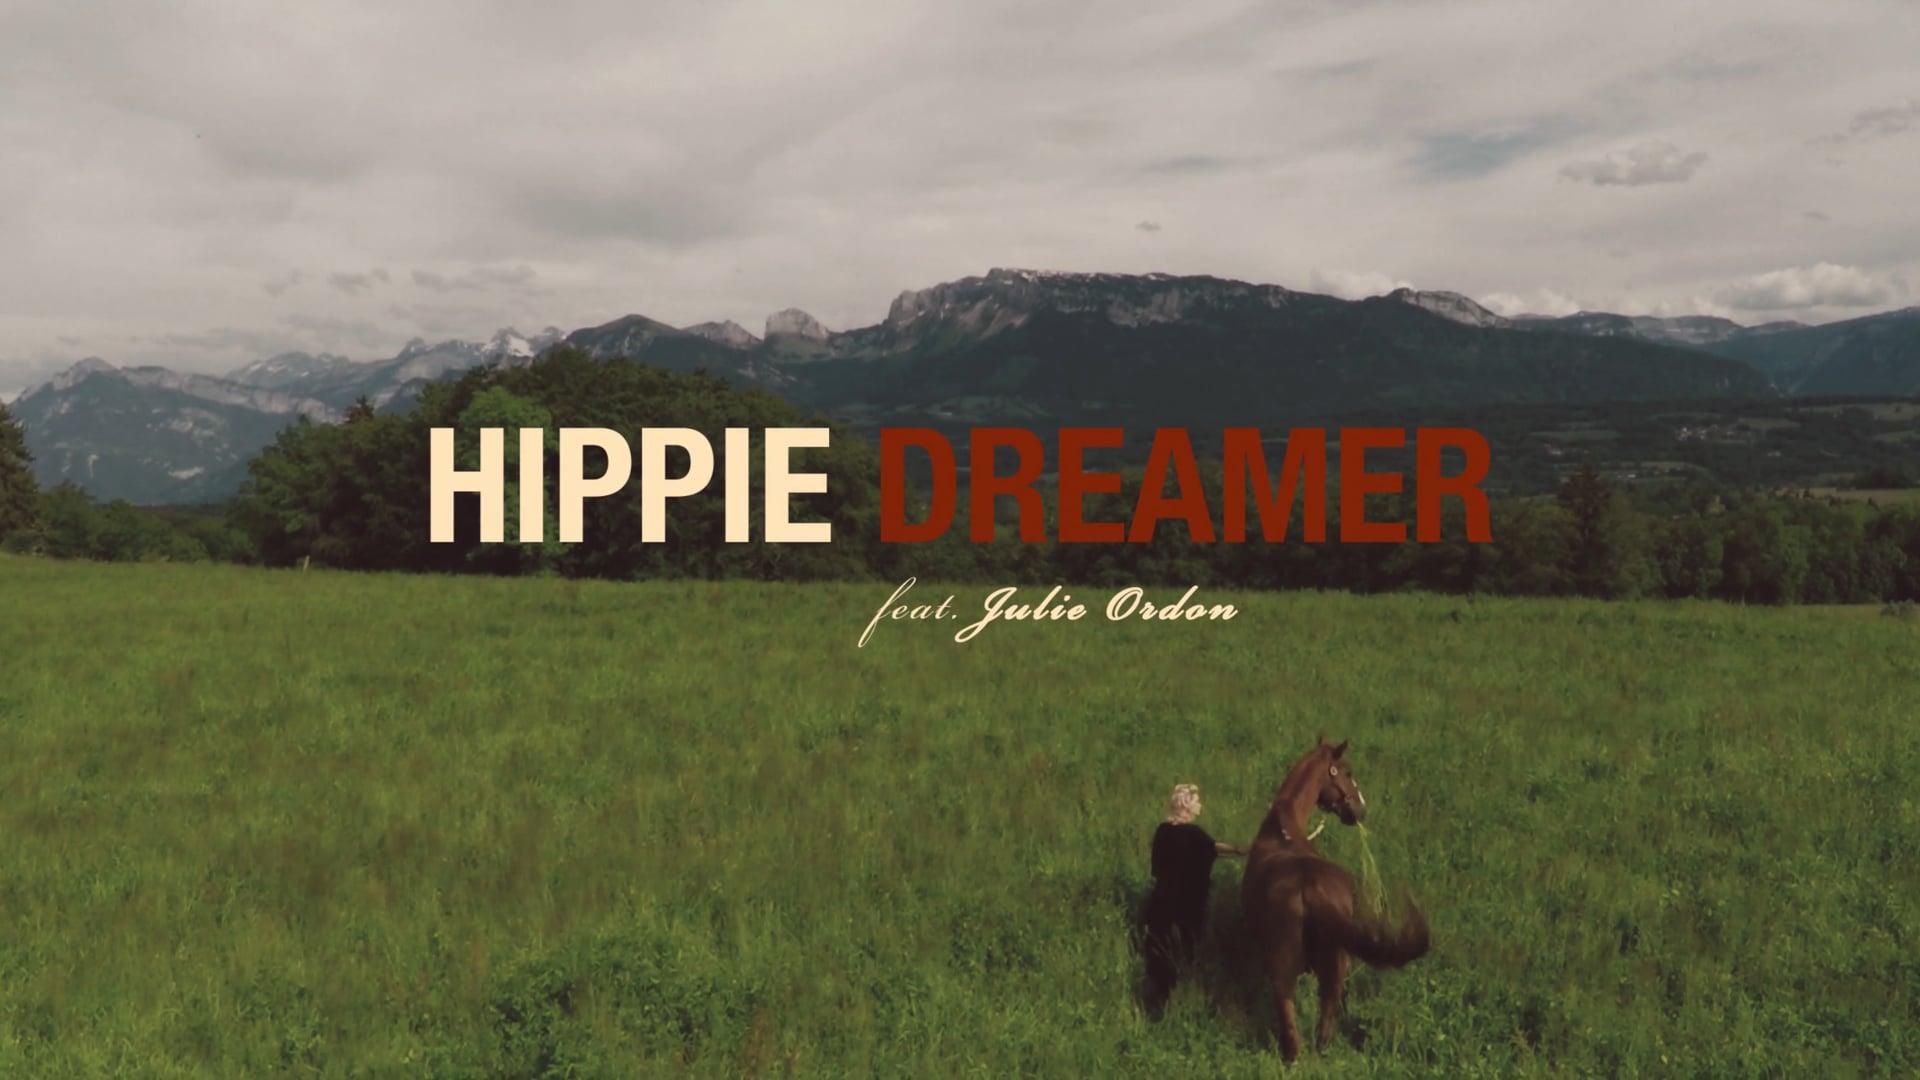 HIPPIE DREAMER feat. Julie Ordon for Eyes Magazine